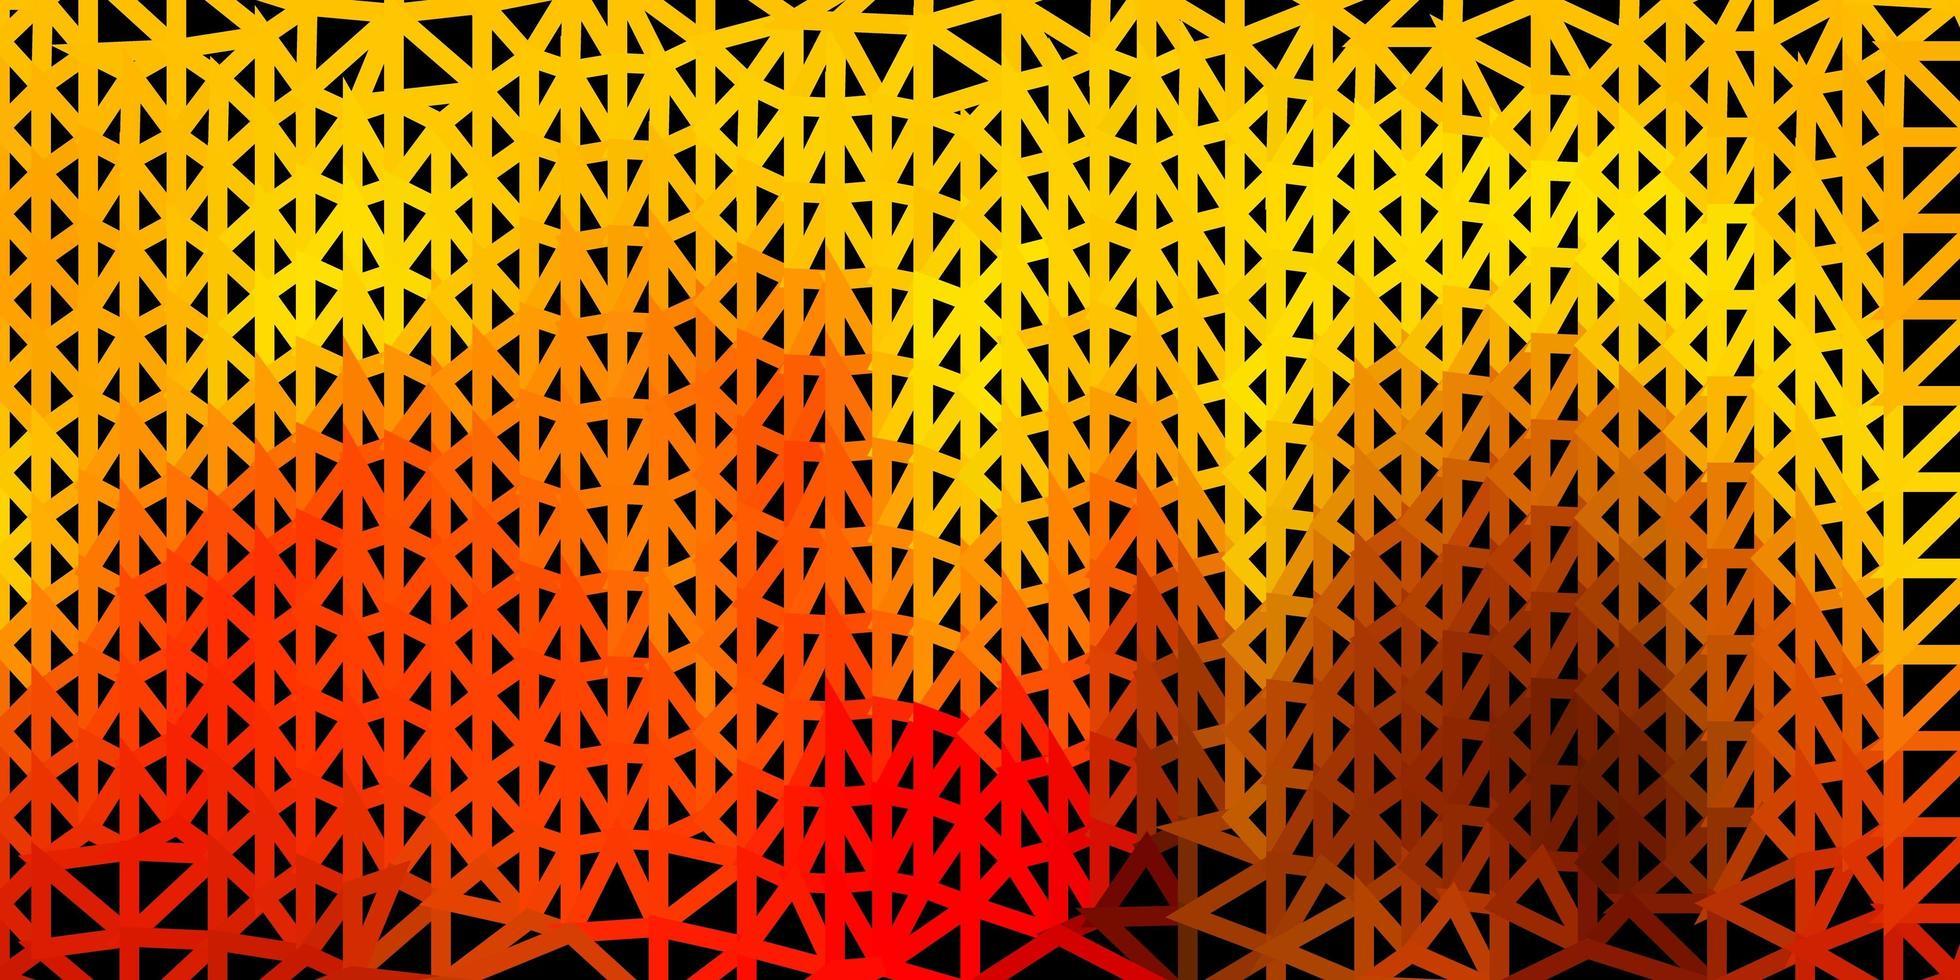 papel tapiz poligonal geométrico vector rojo claro, amarillo.